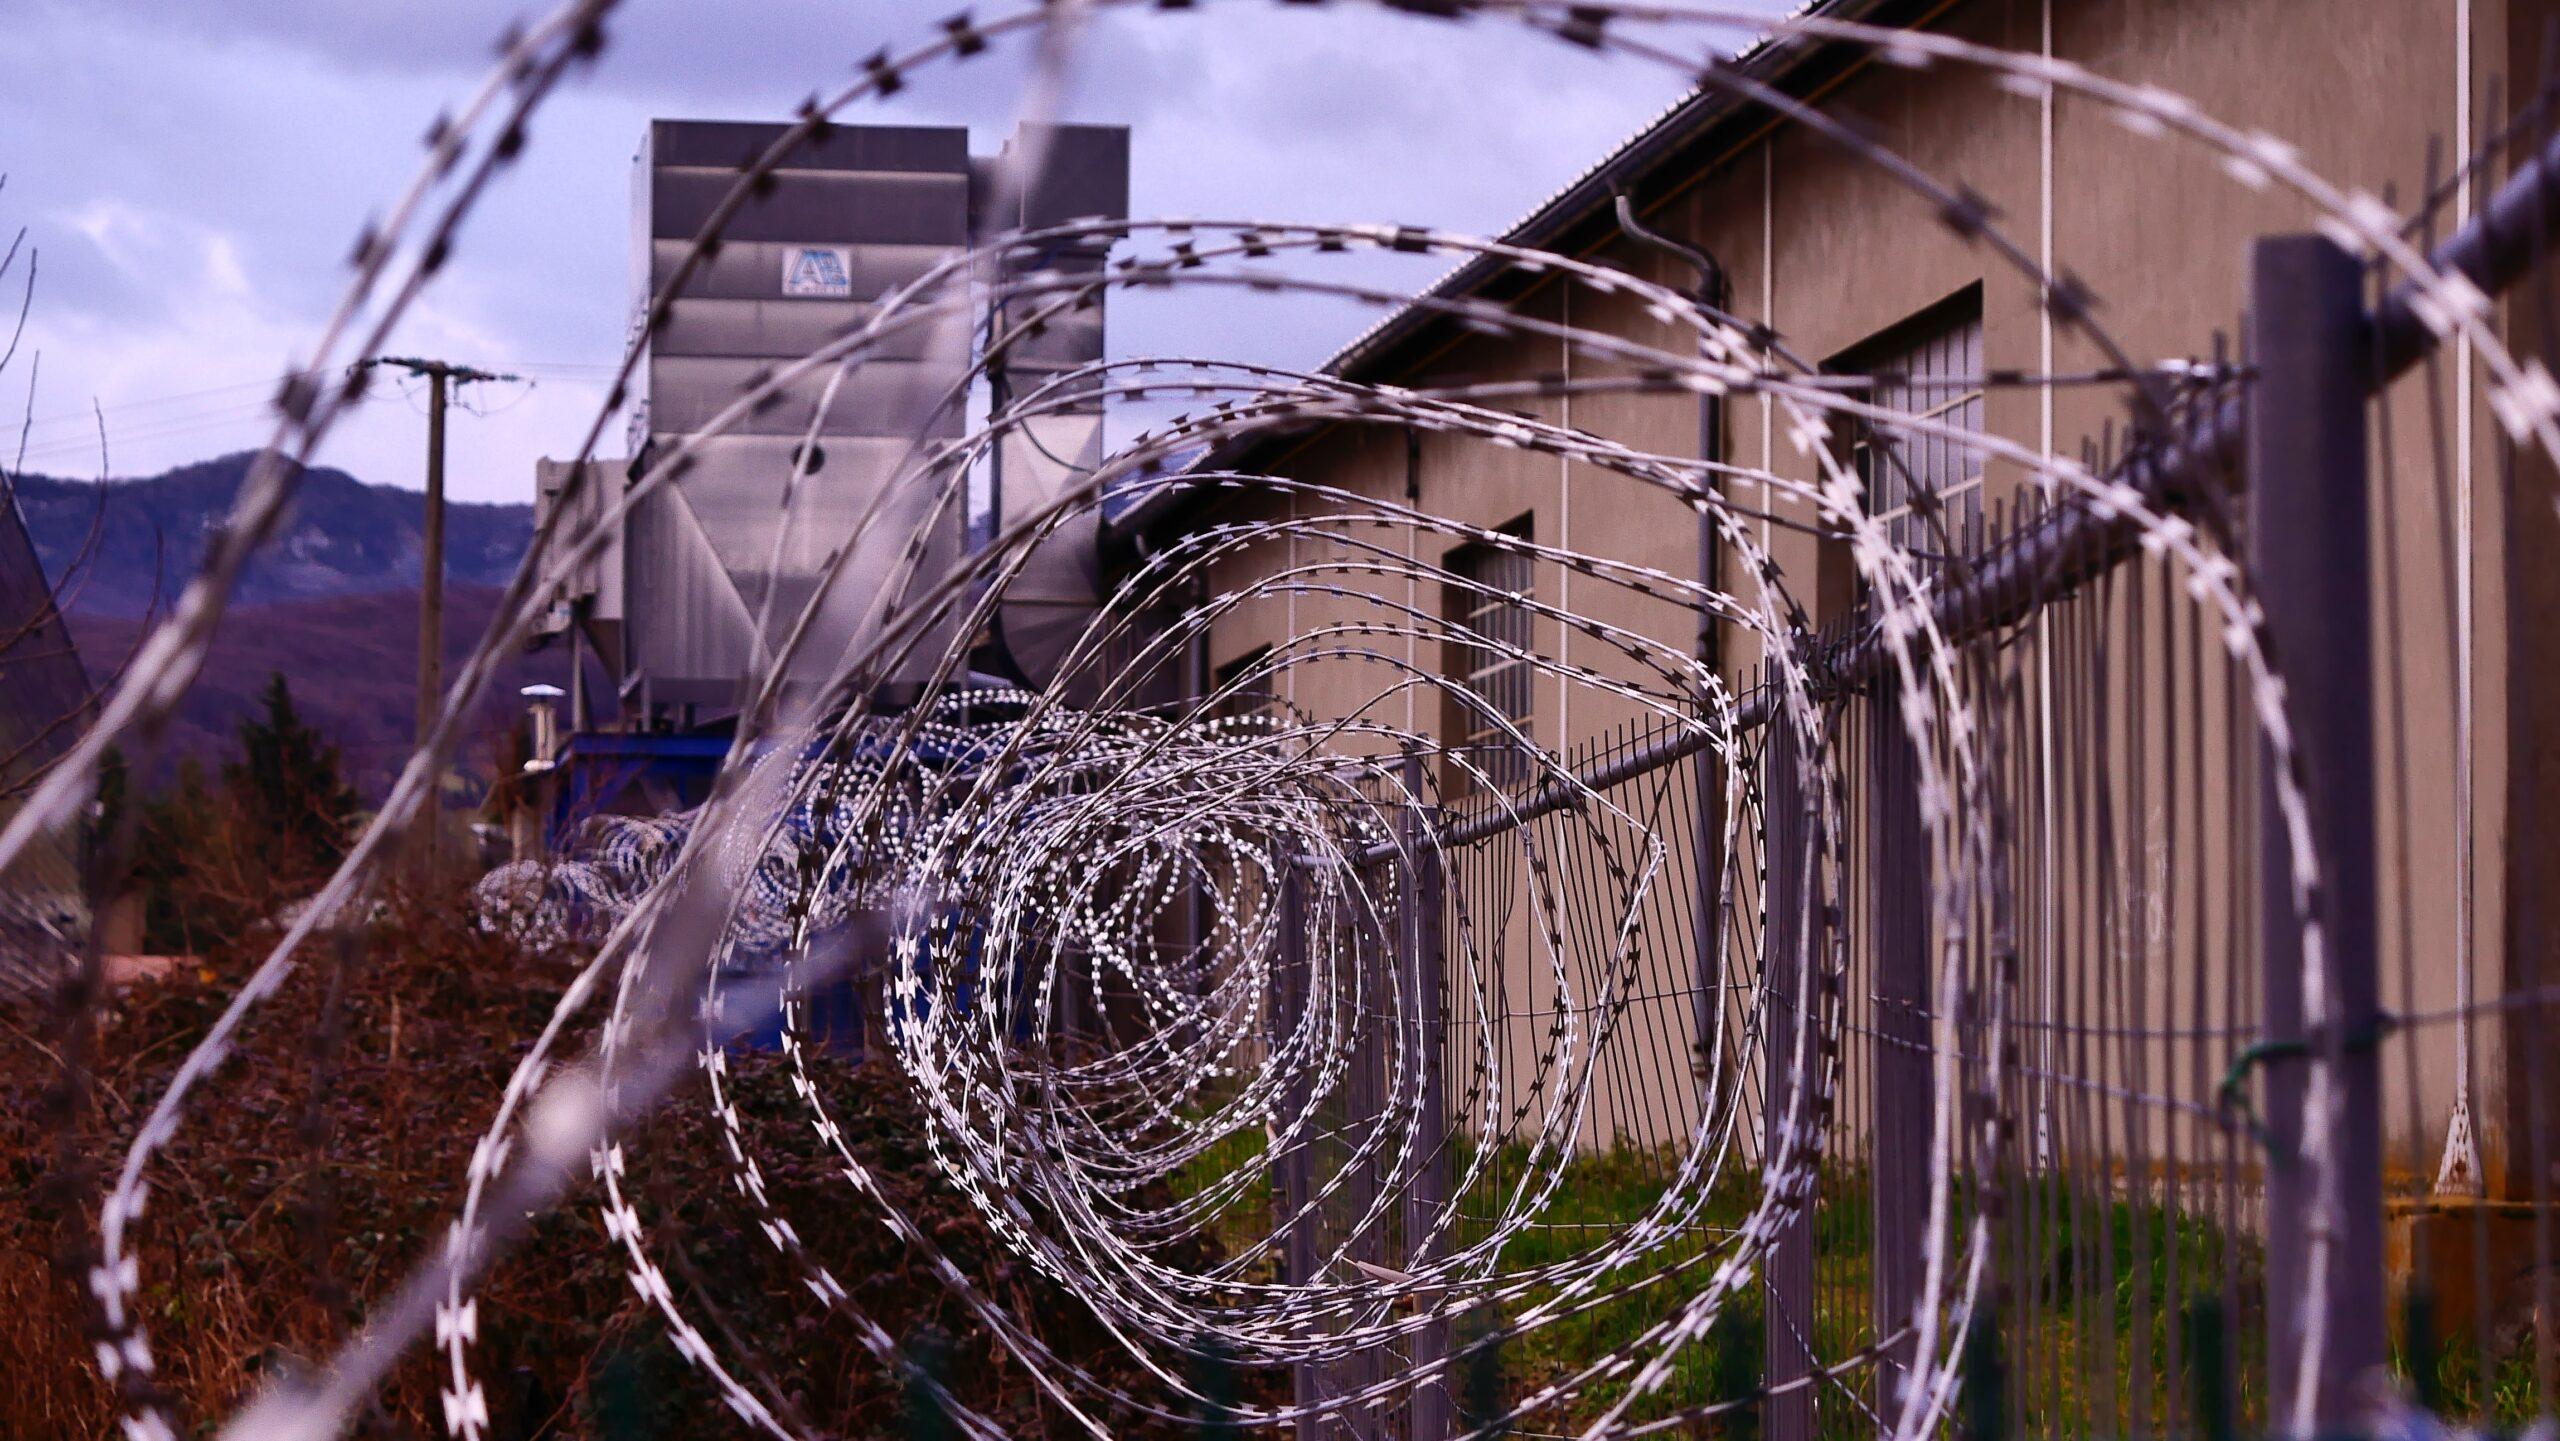 Komisja penitencjarna – jakie pełni funkcje?